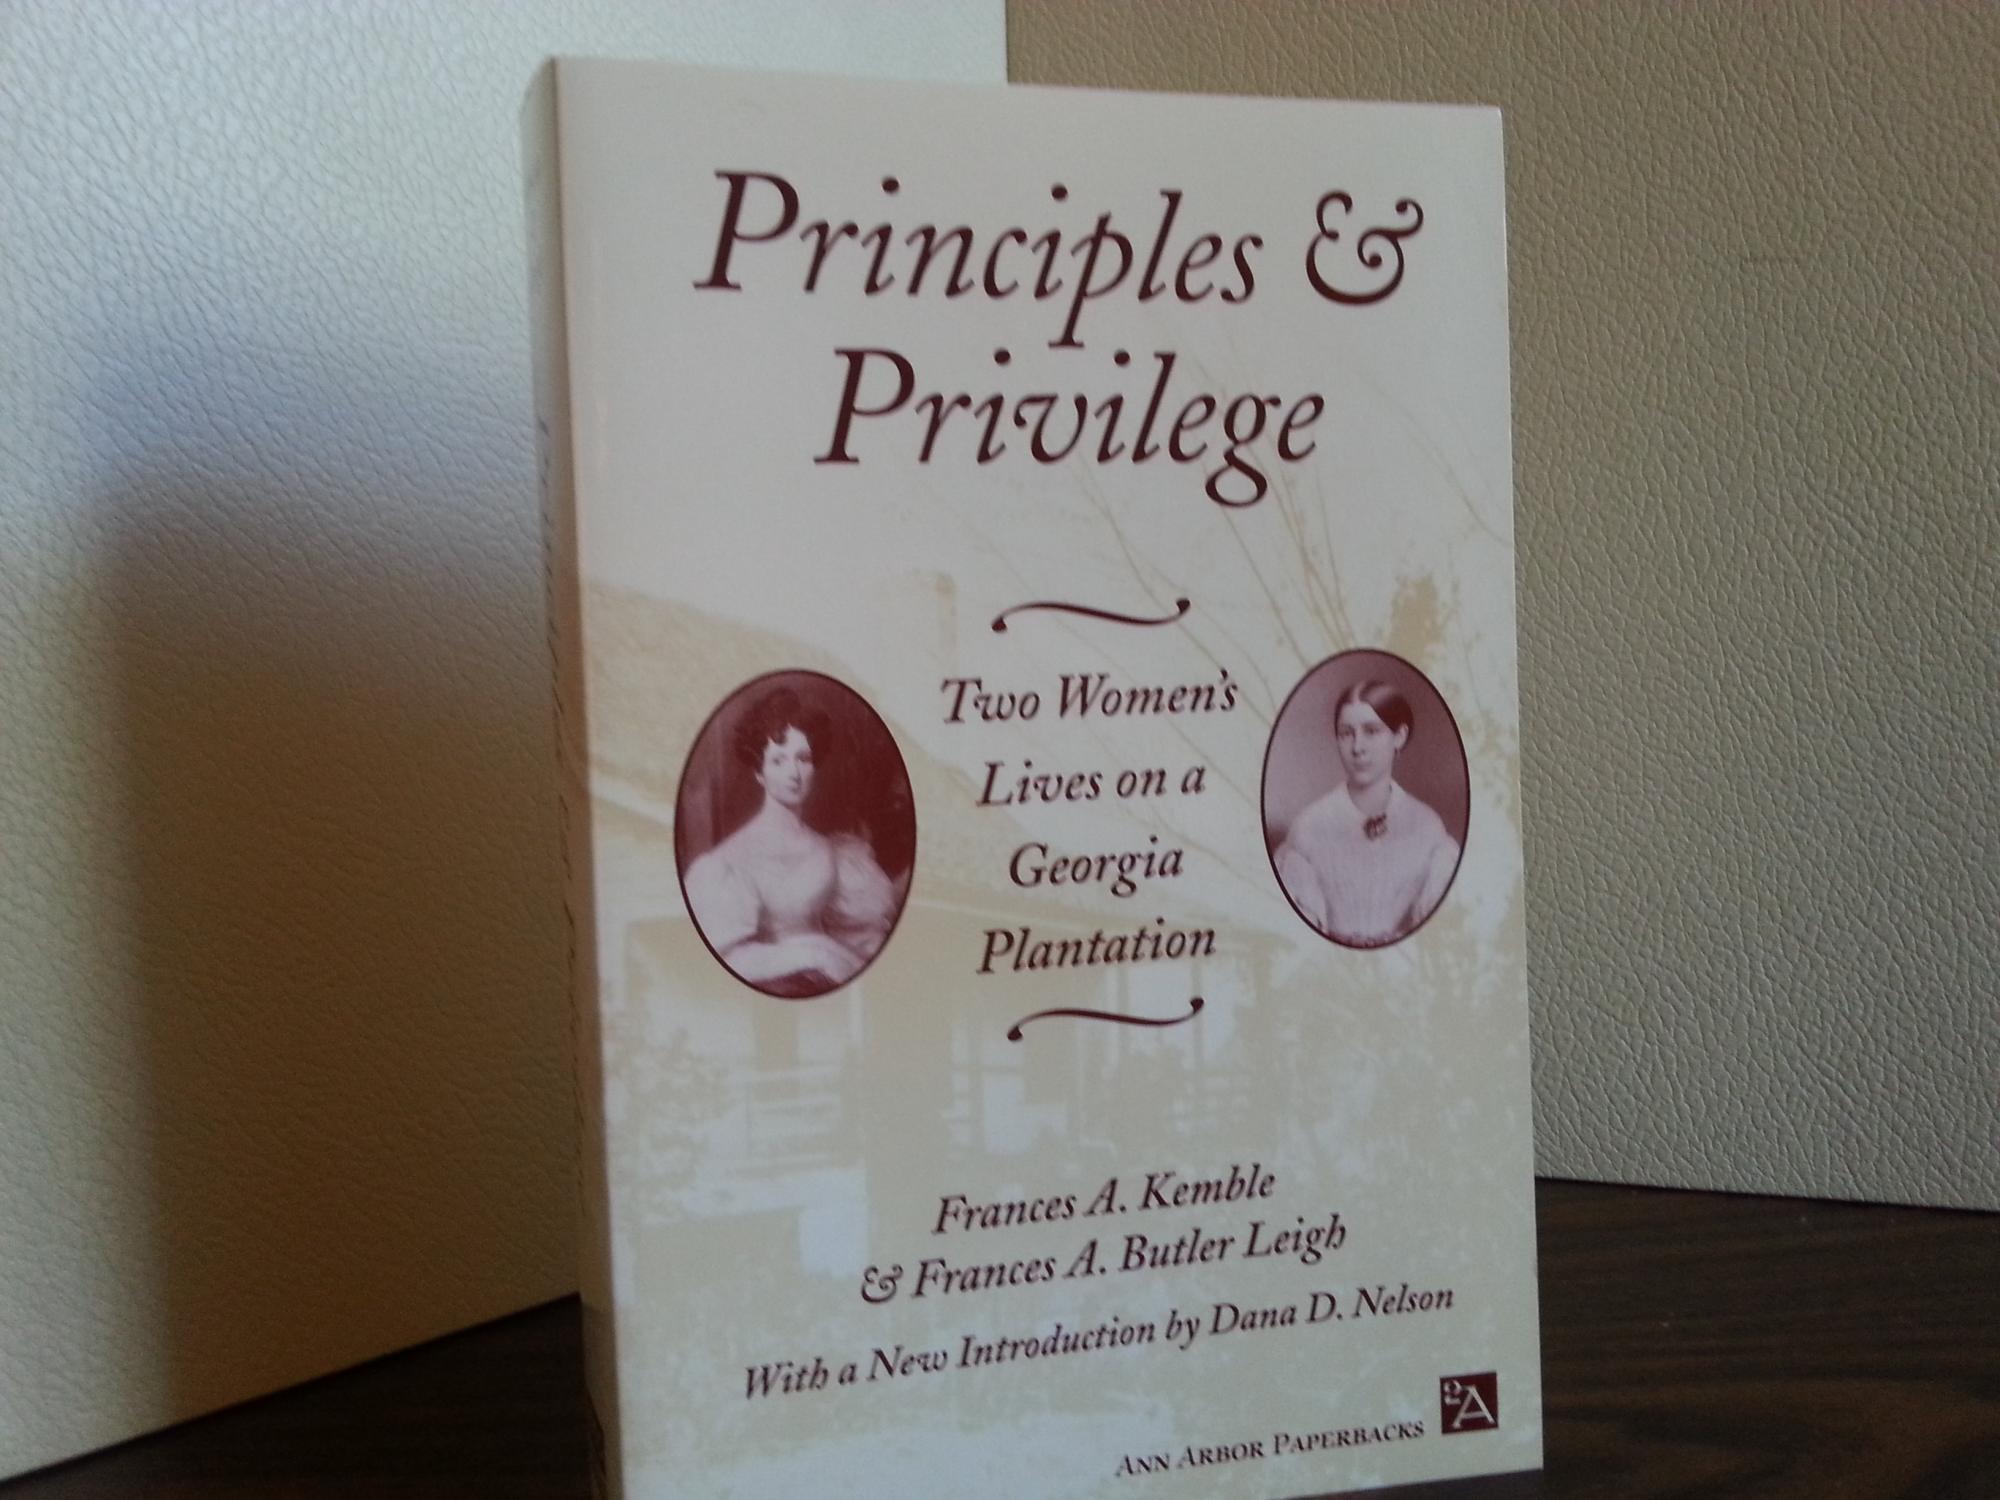 Principles & Privilege: Two Women's Lives On A Georgia Plantation - Kemble, Frances A. and Frances A. Butler Leigh